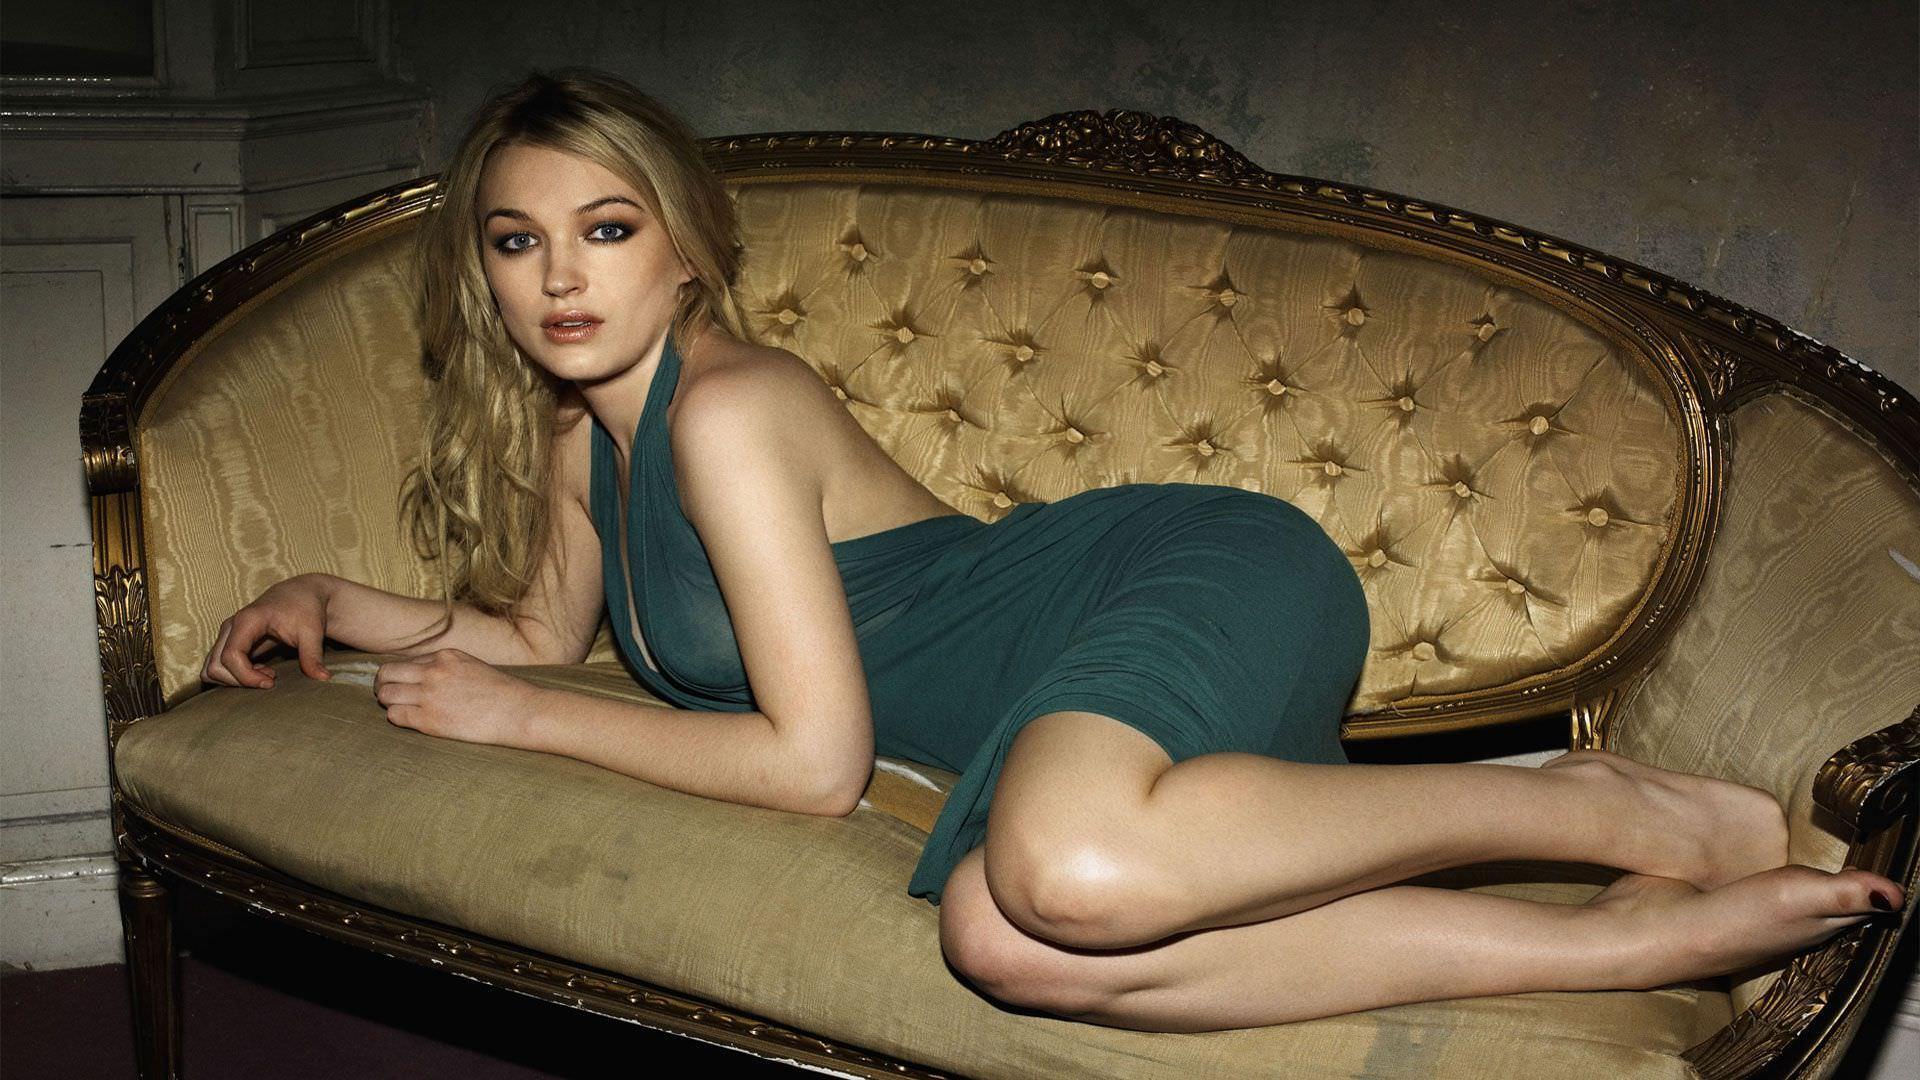 Марго Робби фото на диване